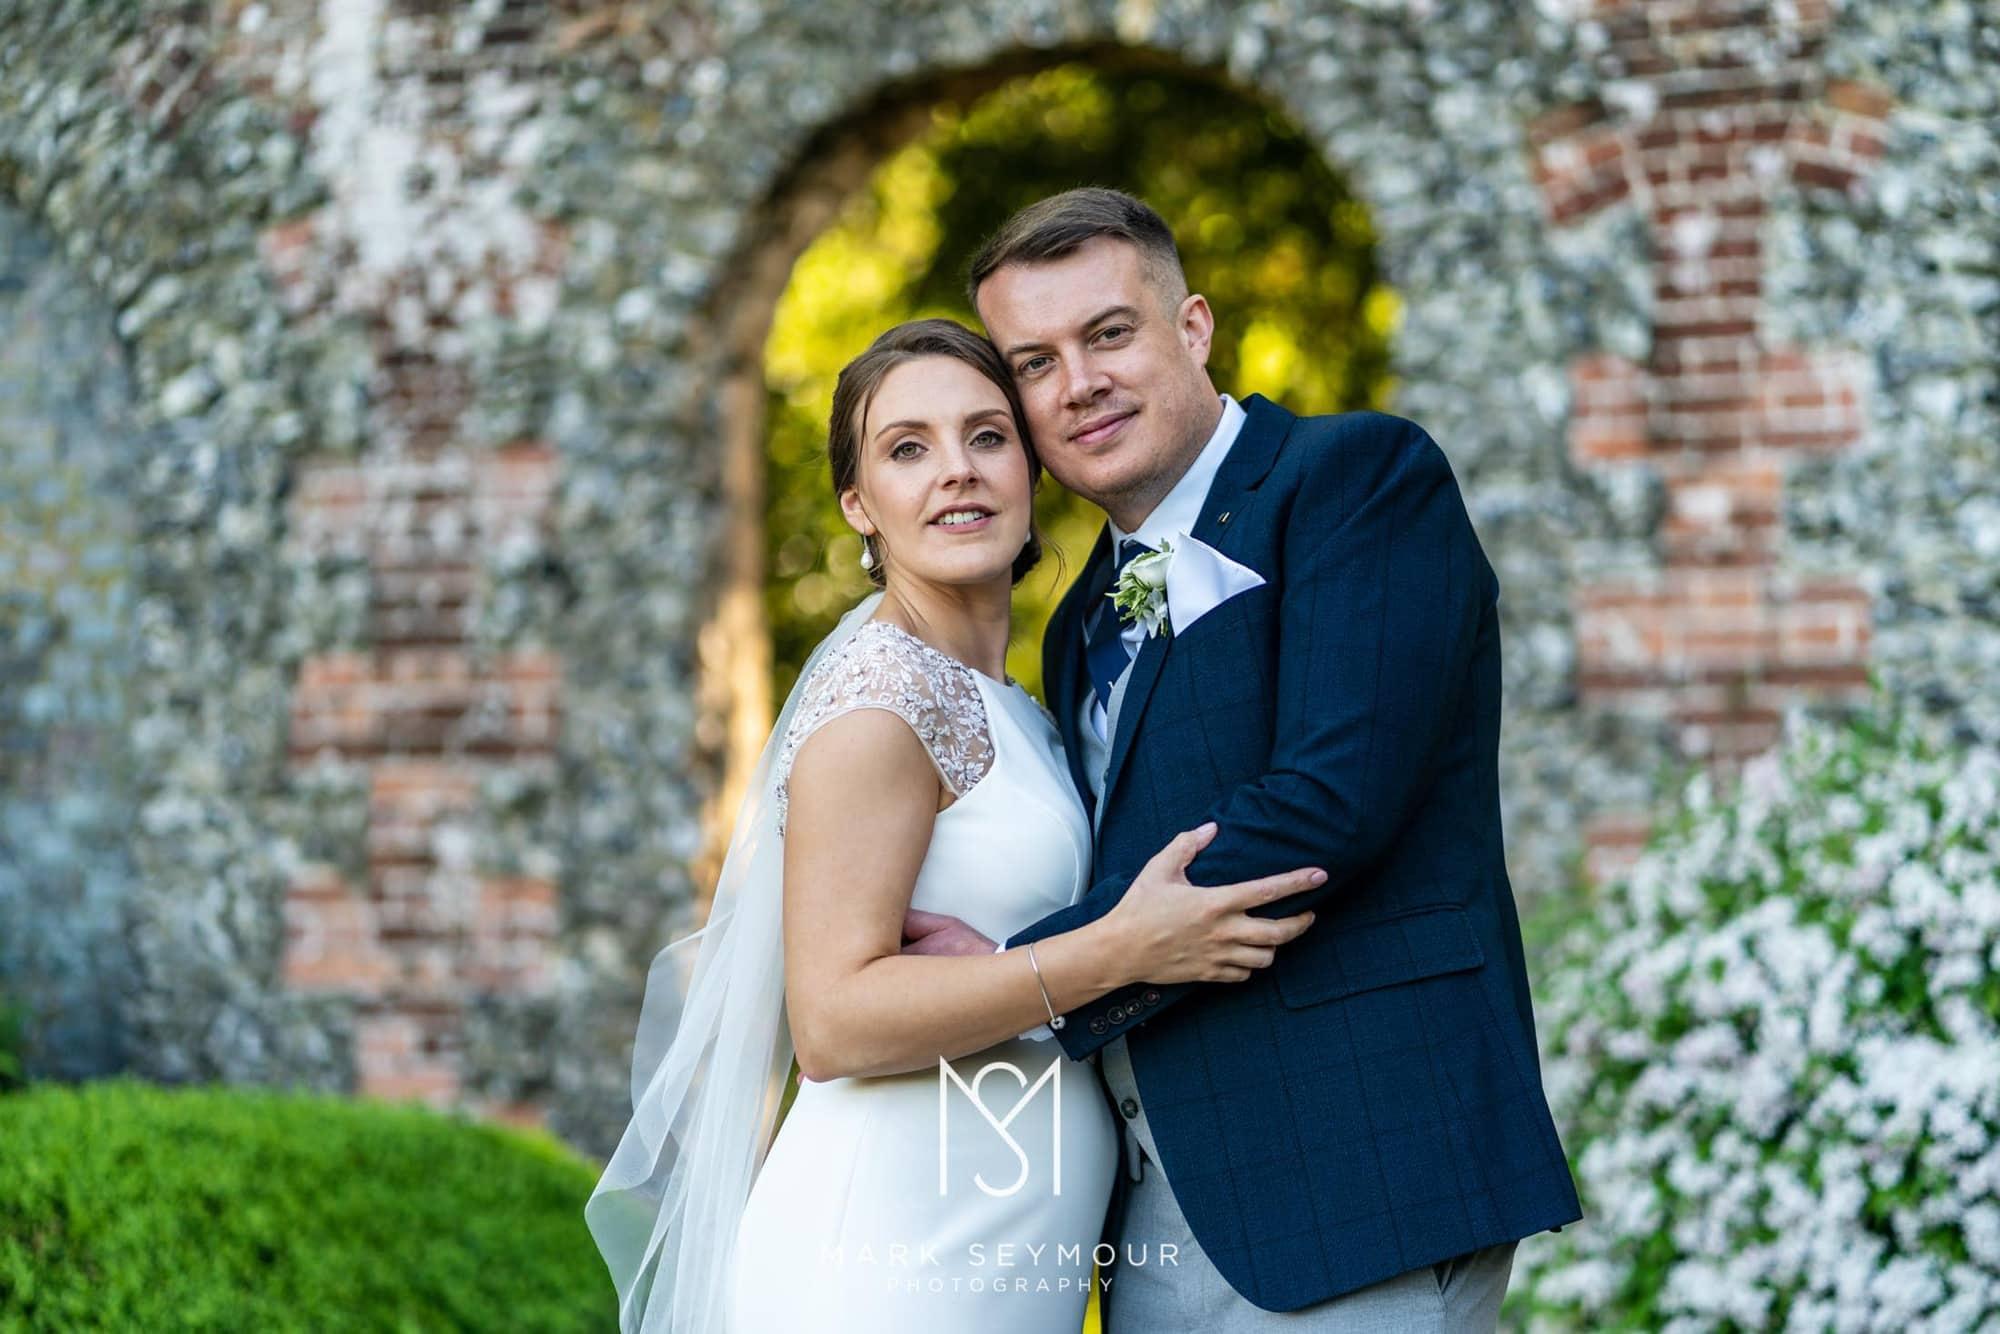 Hampden House Wedding Photography - Hannah and Lee's wedding. 23